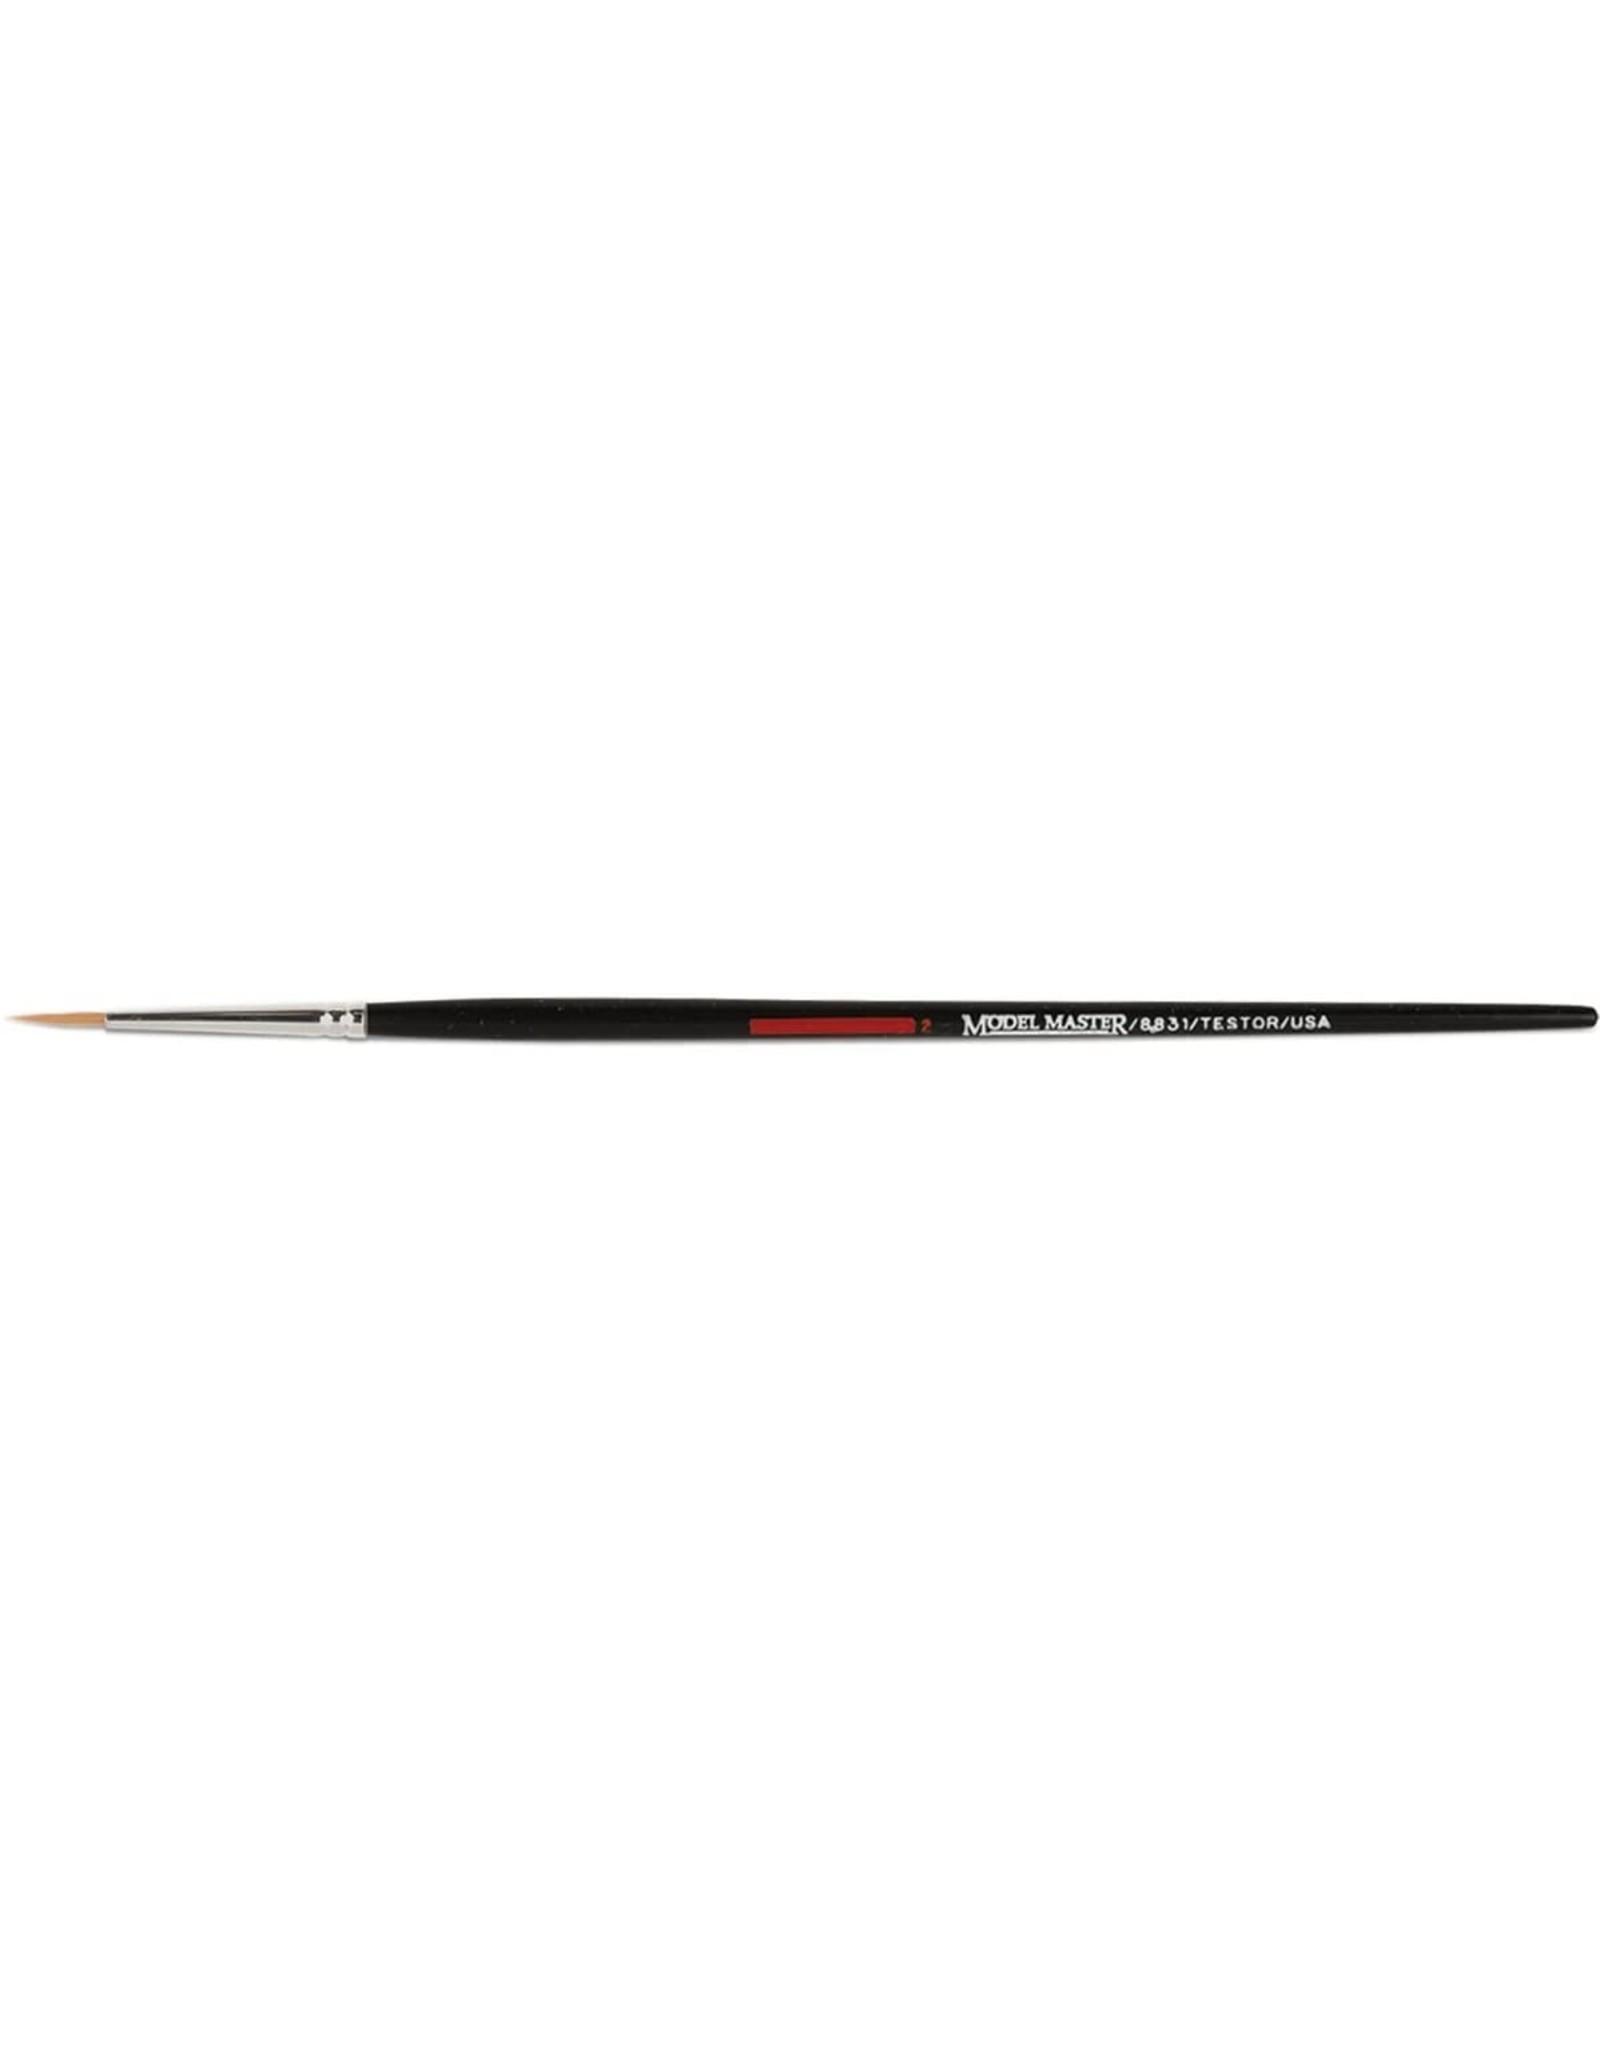 Testors 8831C - Golden Synthetic Round Brush #2